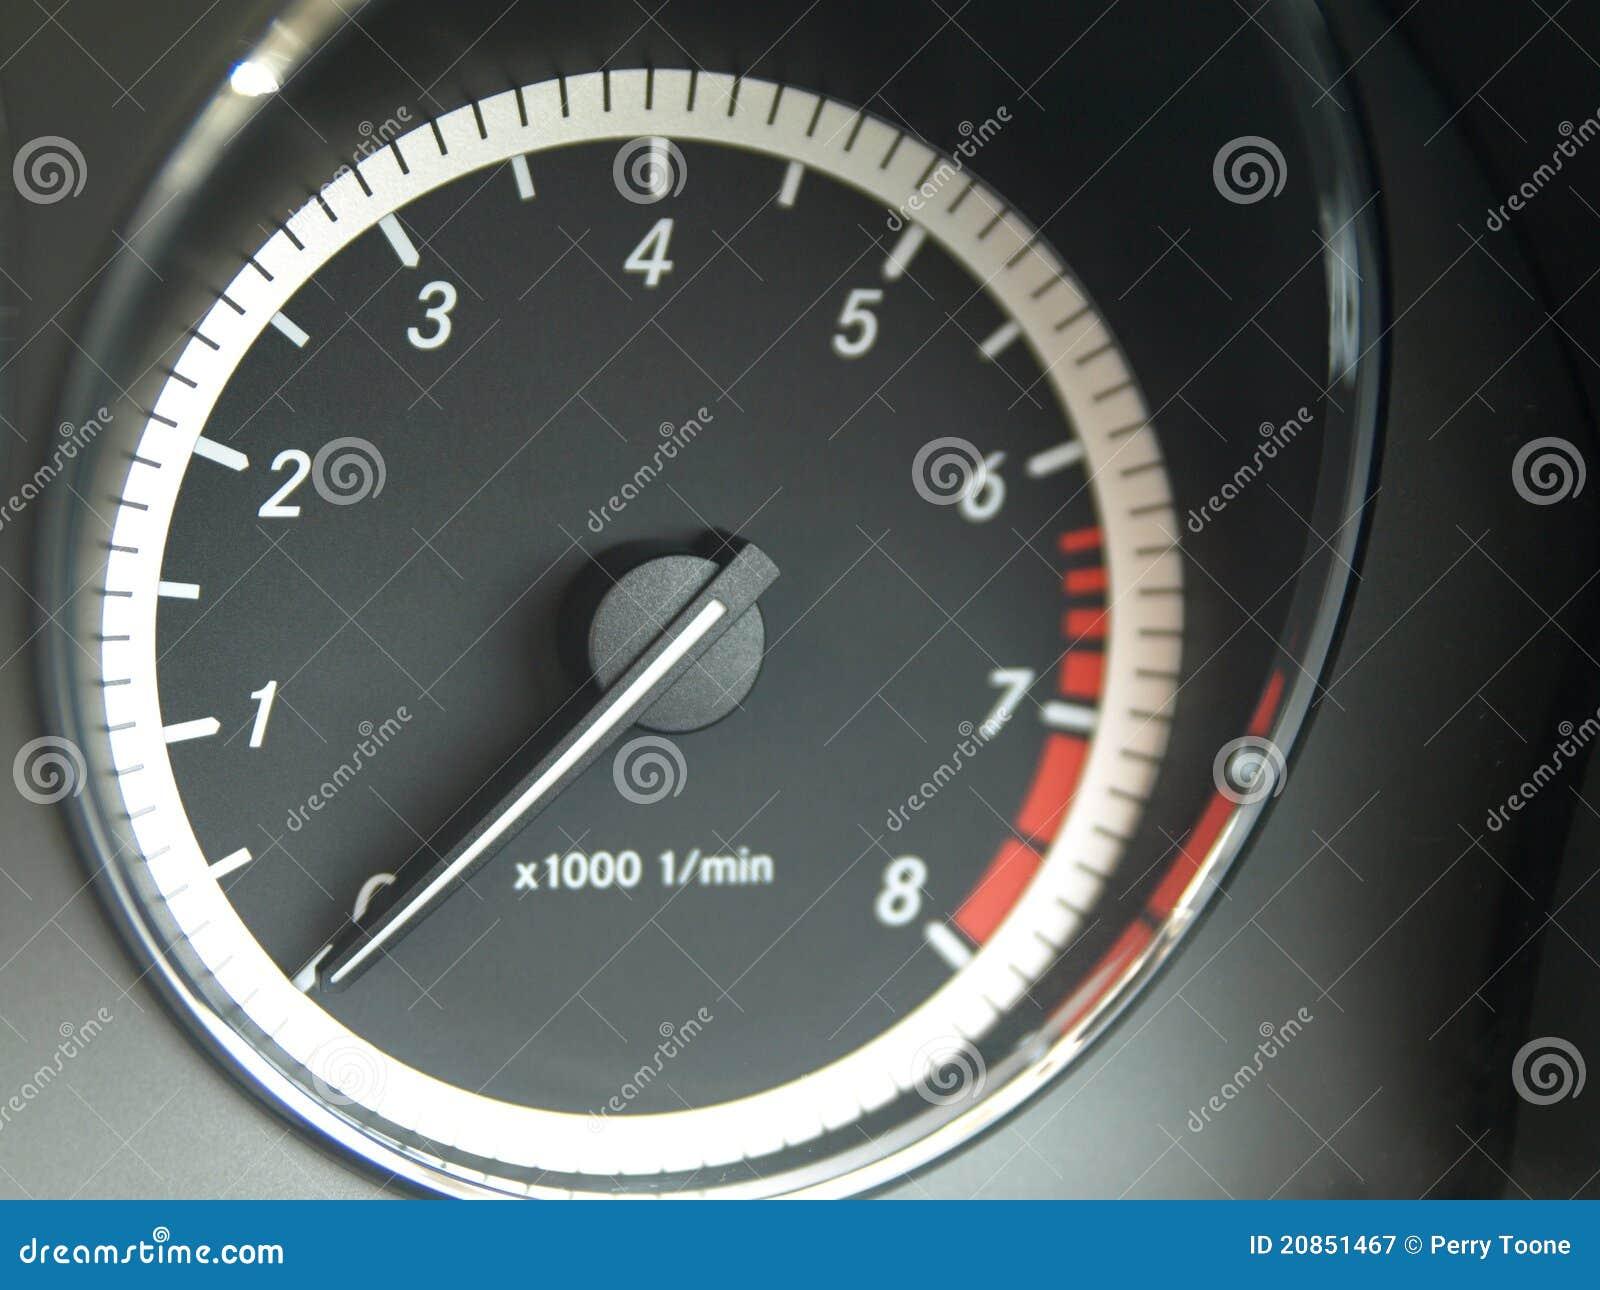 rpm meter stock image image of dial performance revs 20851467